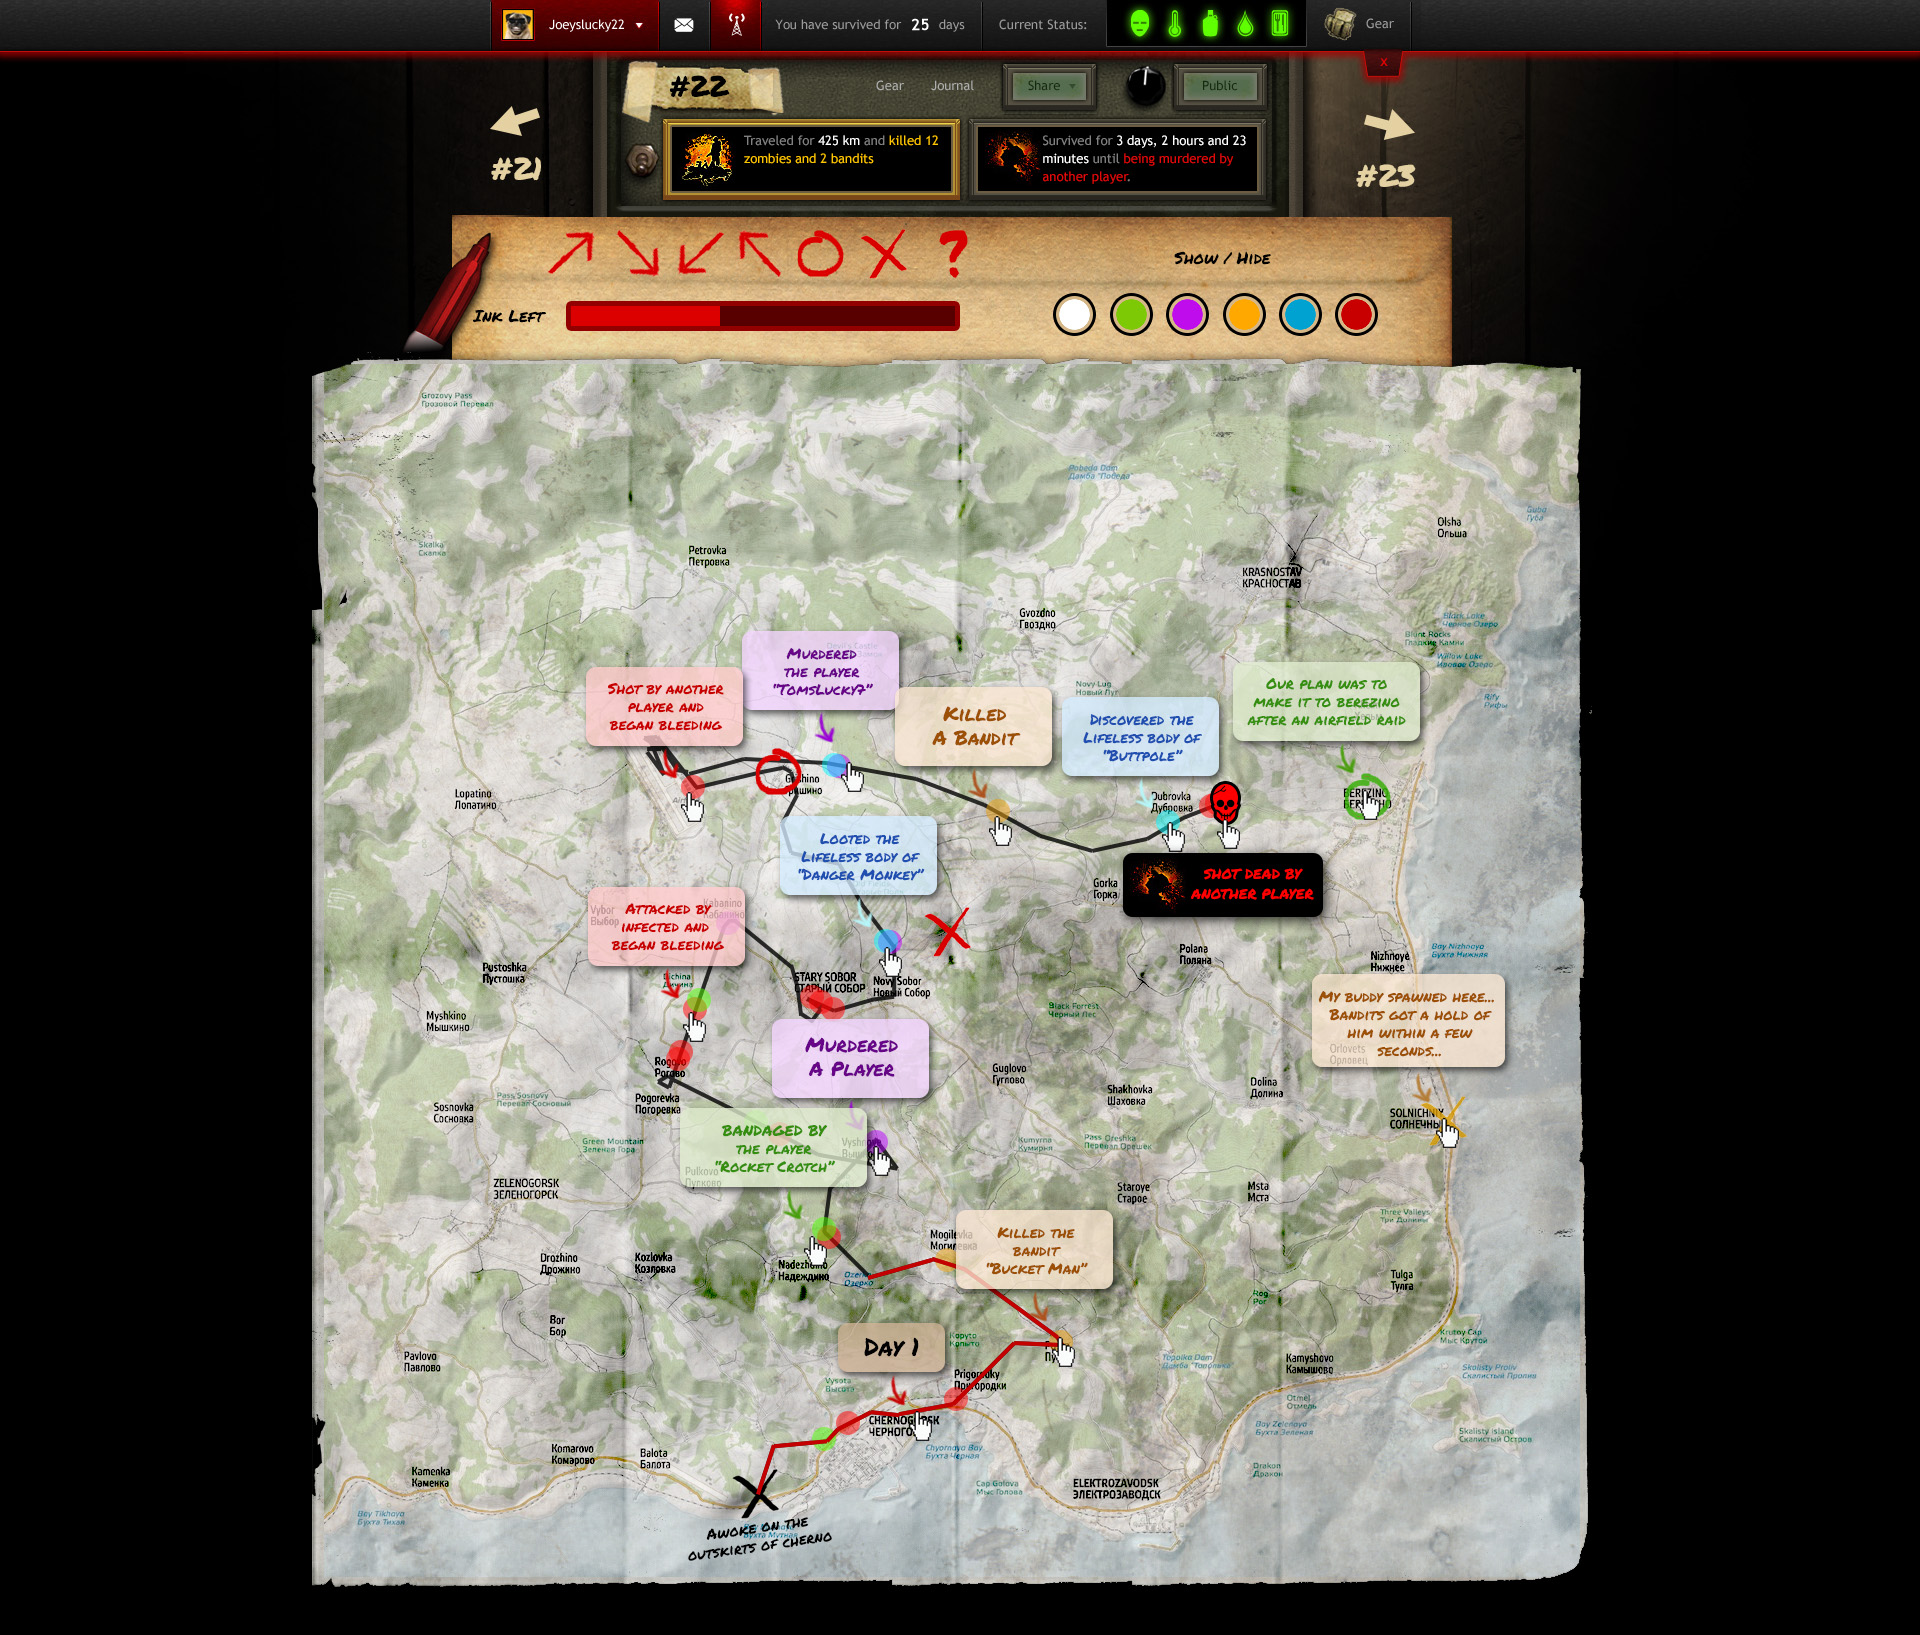 http://joeflashedme.com/dayz/concept/stuff/web-mapped.jpg